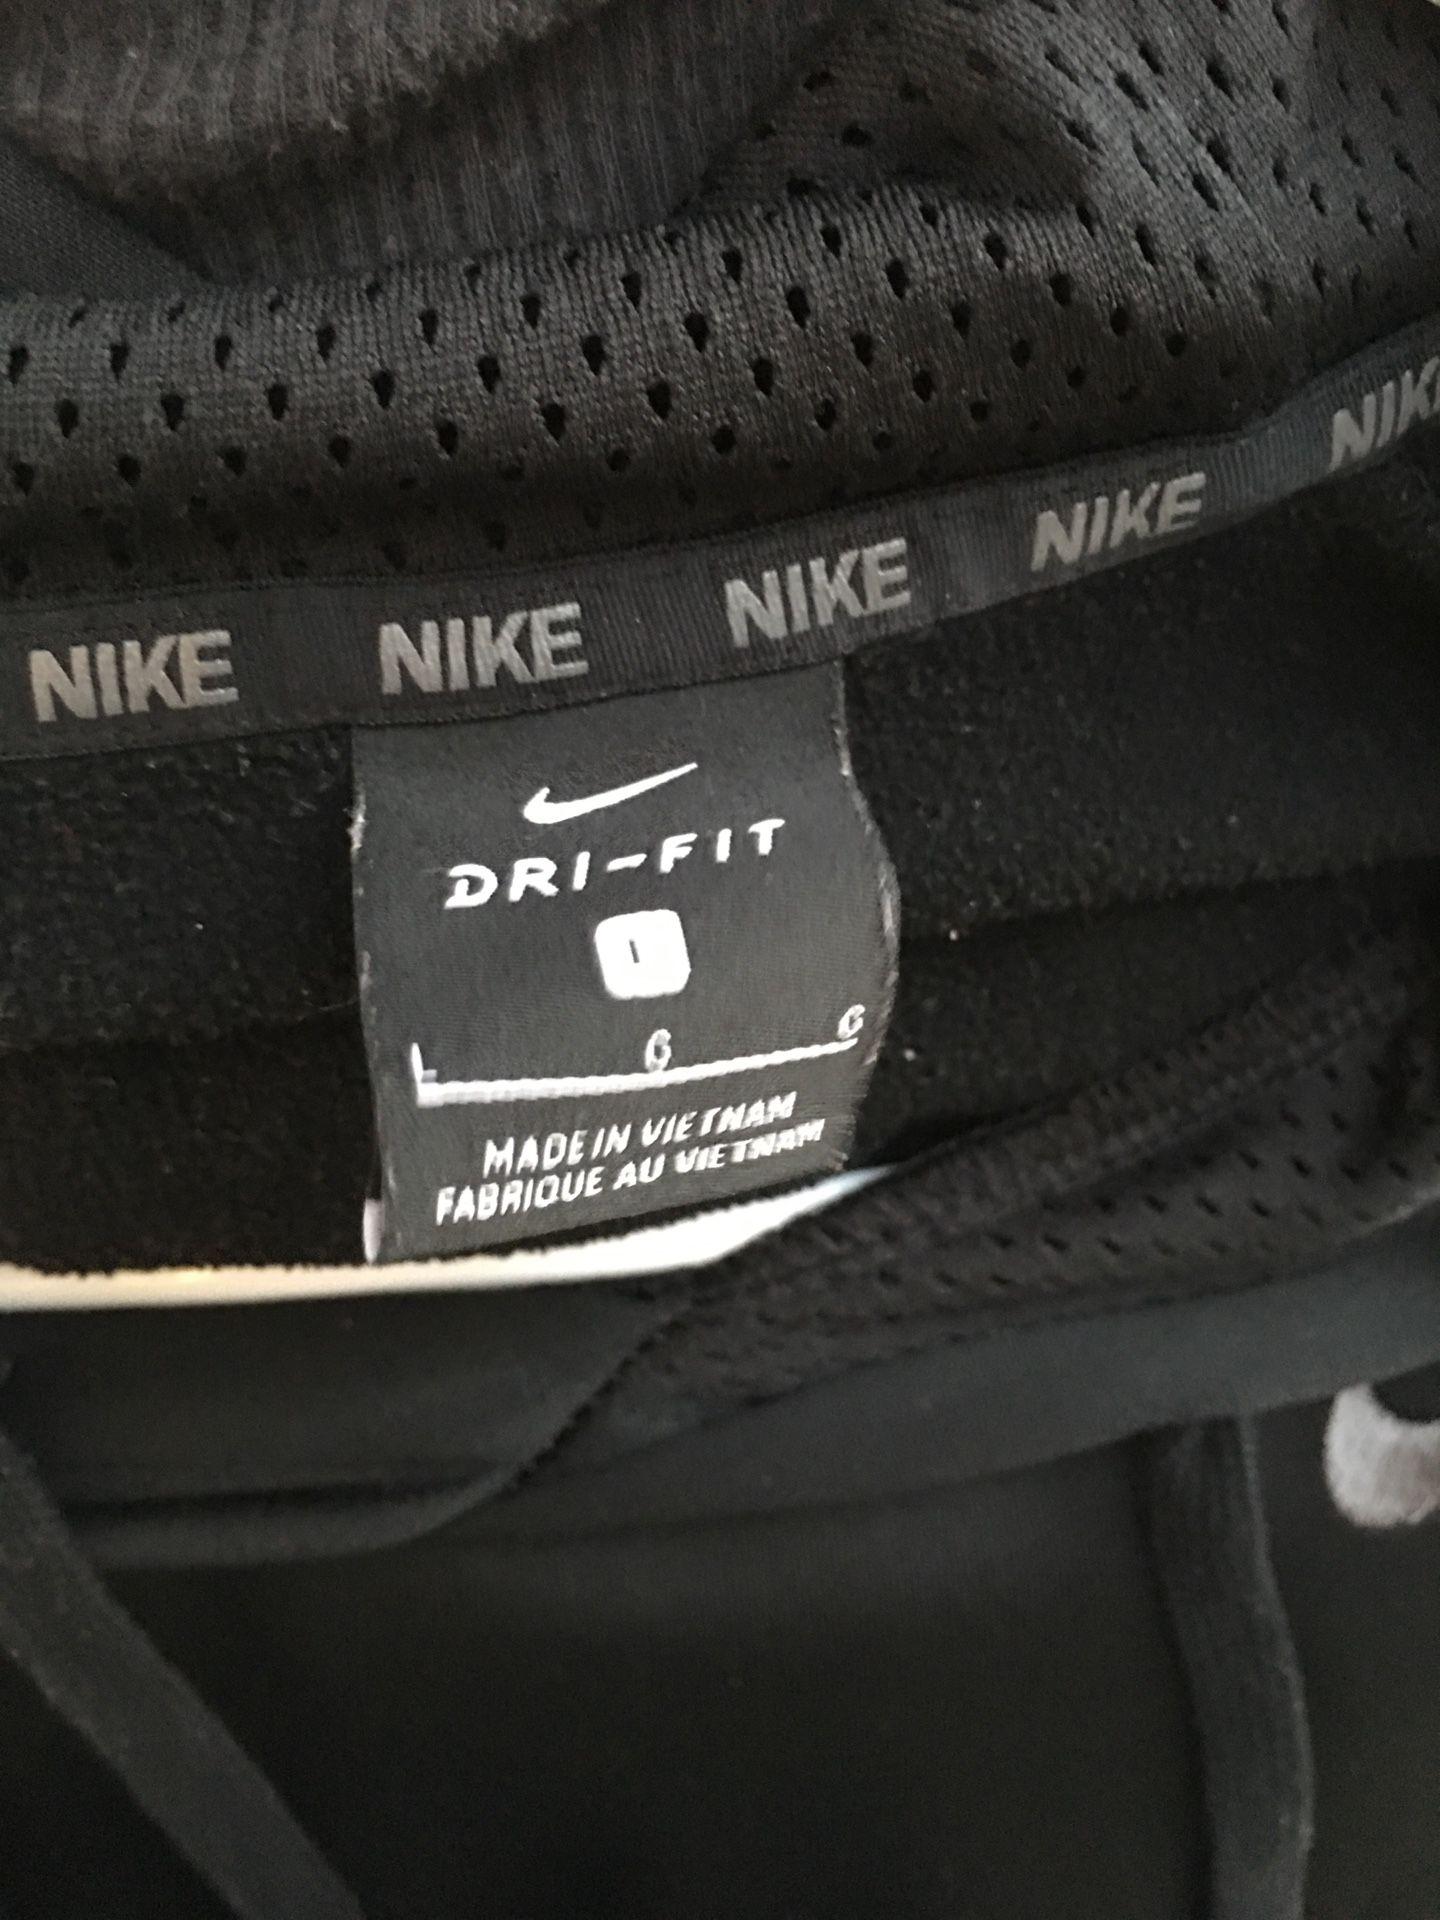 Nike Dri-fit Therma Short Sleeve Basketball Hoodie